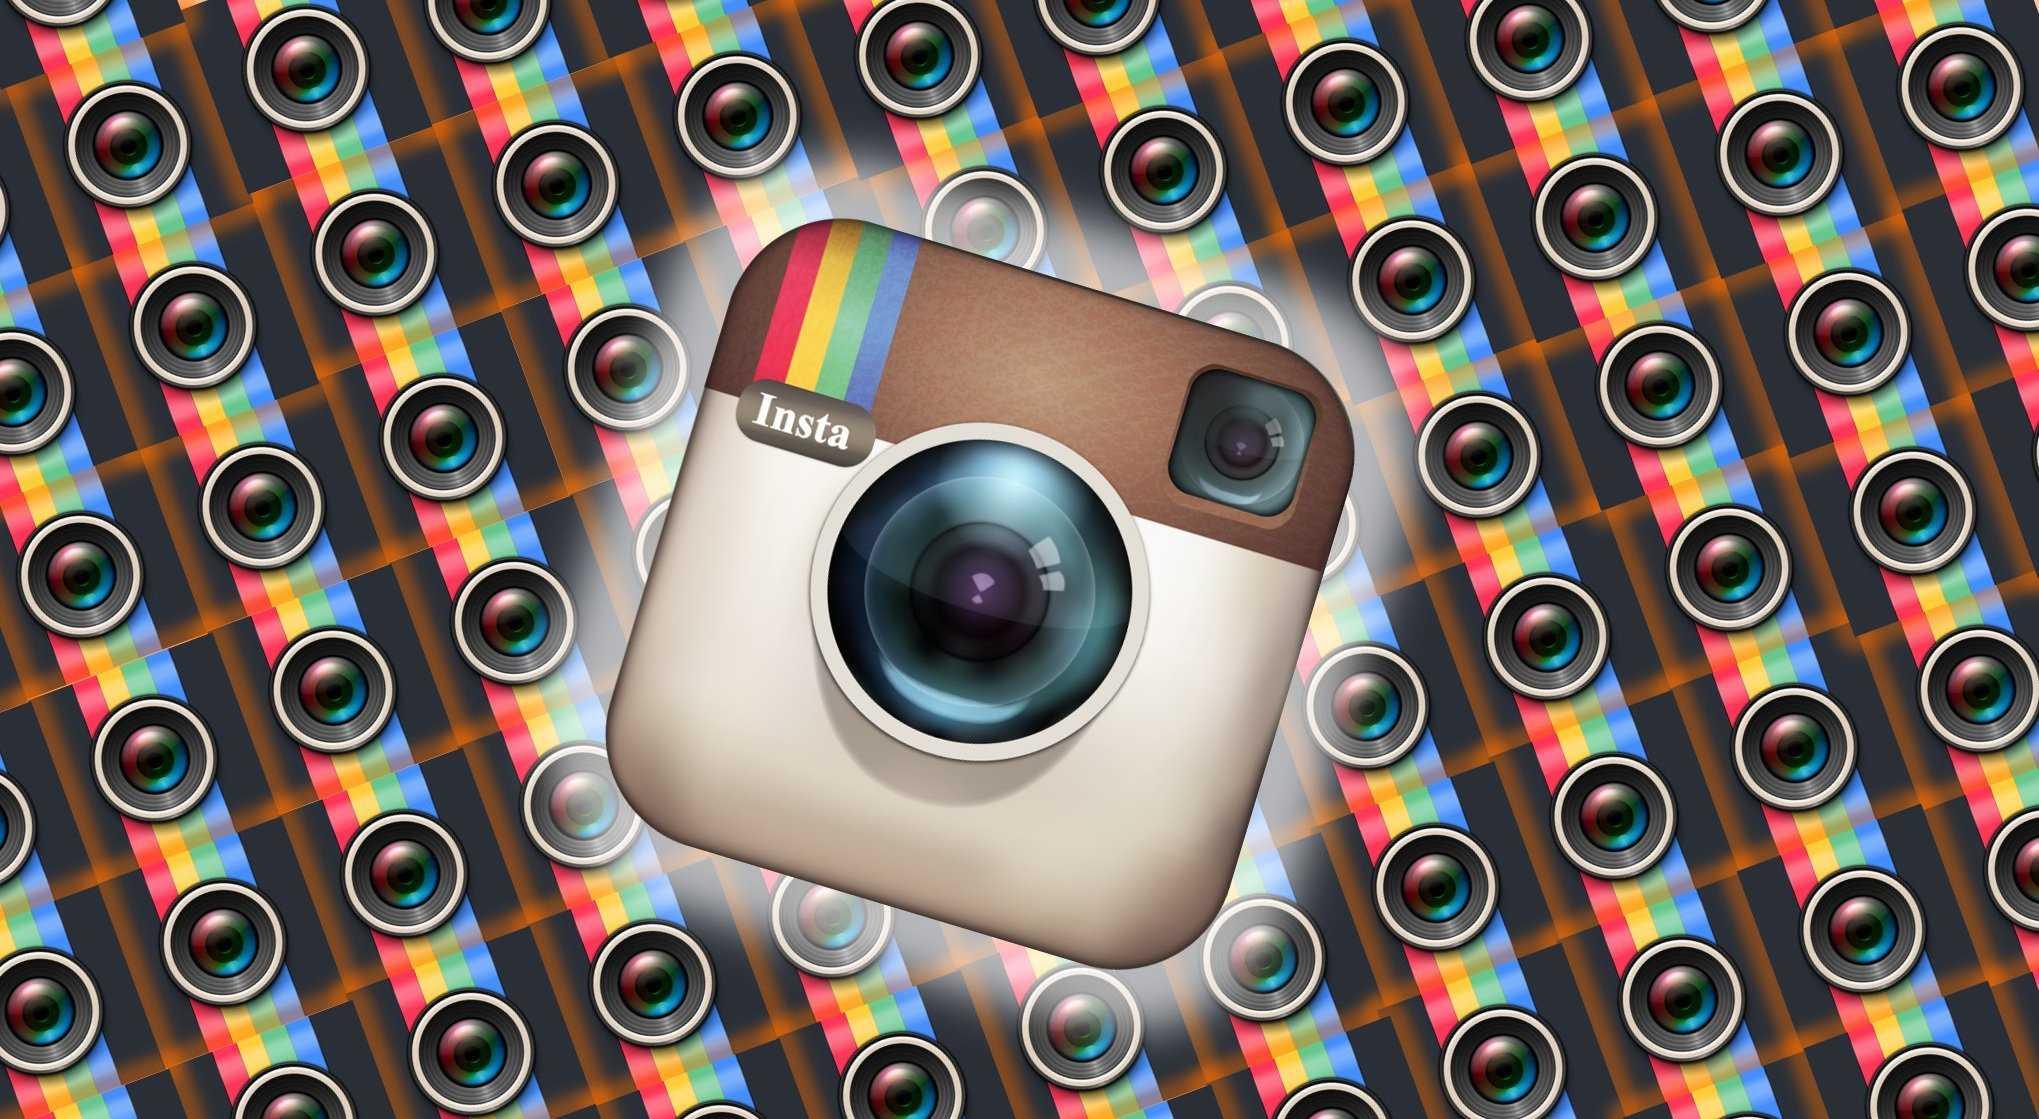 28391815c تحميل برنامج انستقرام مجانا Download Instagram free برابط مباشر